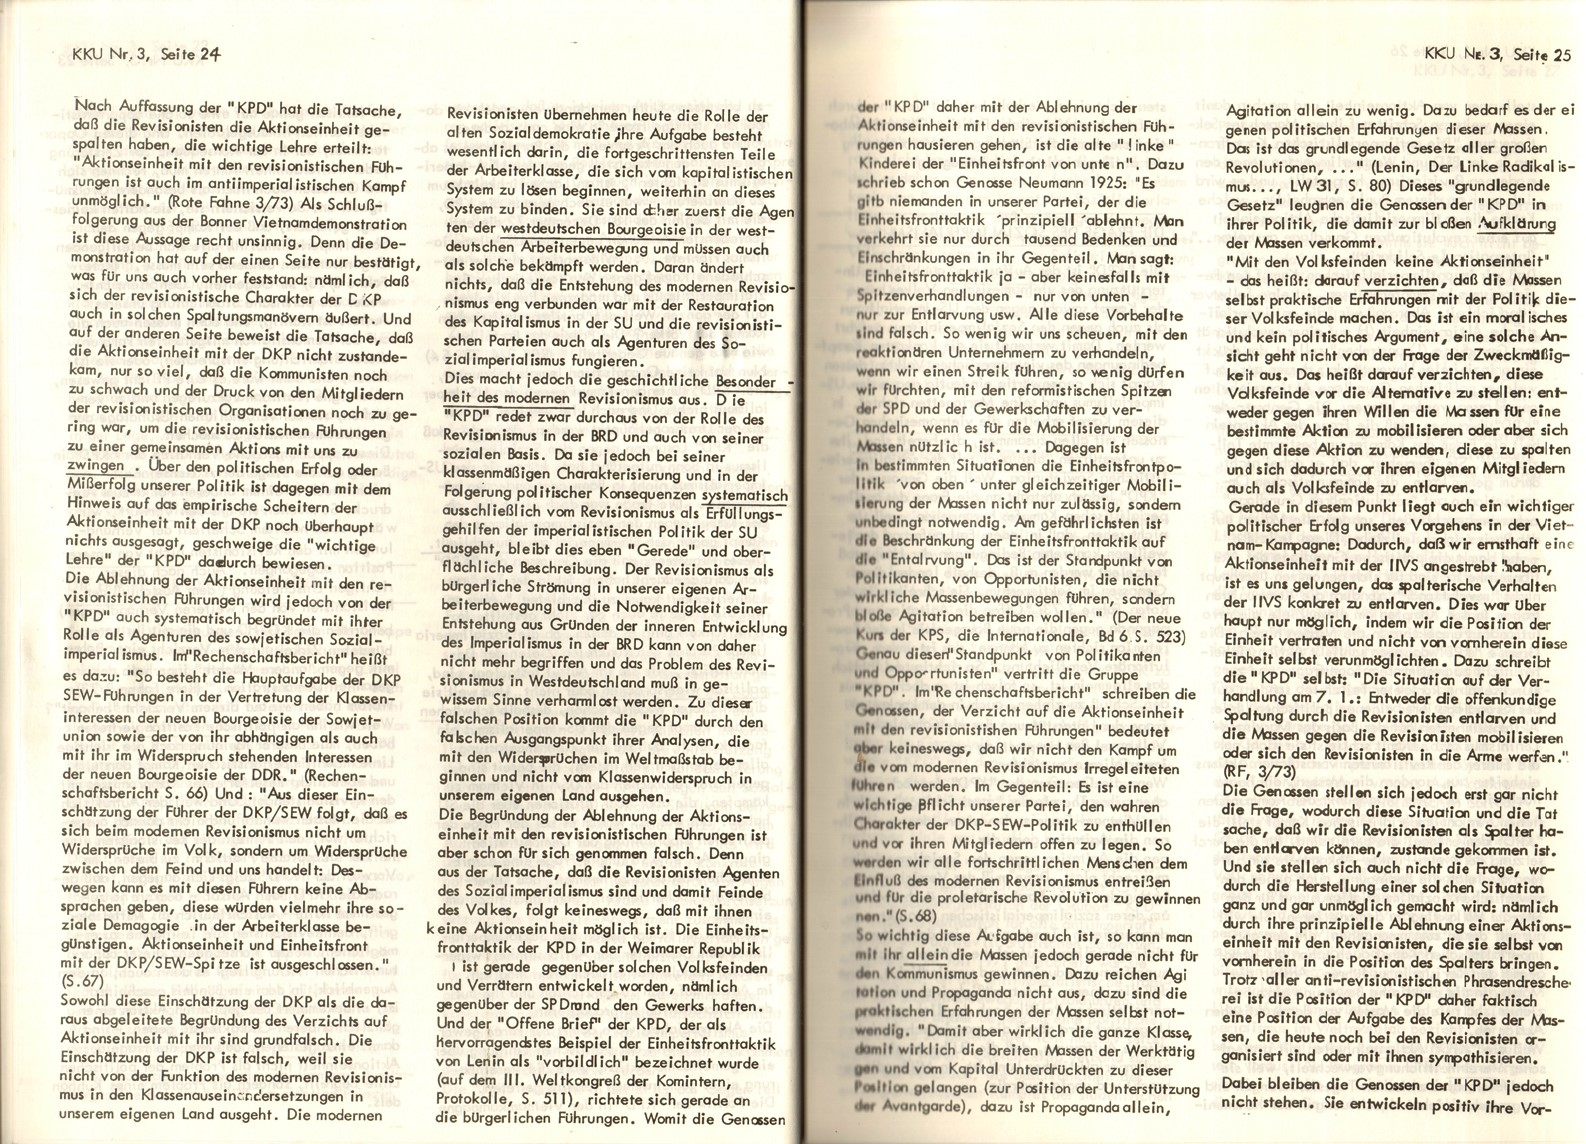 Frankfurt_Offenbach_KG_Kampf_Kritik_Umgestaltung_1973_03_14